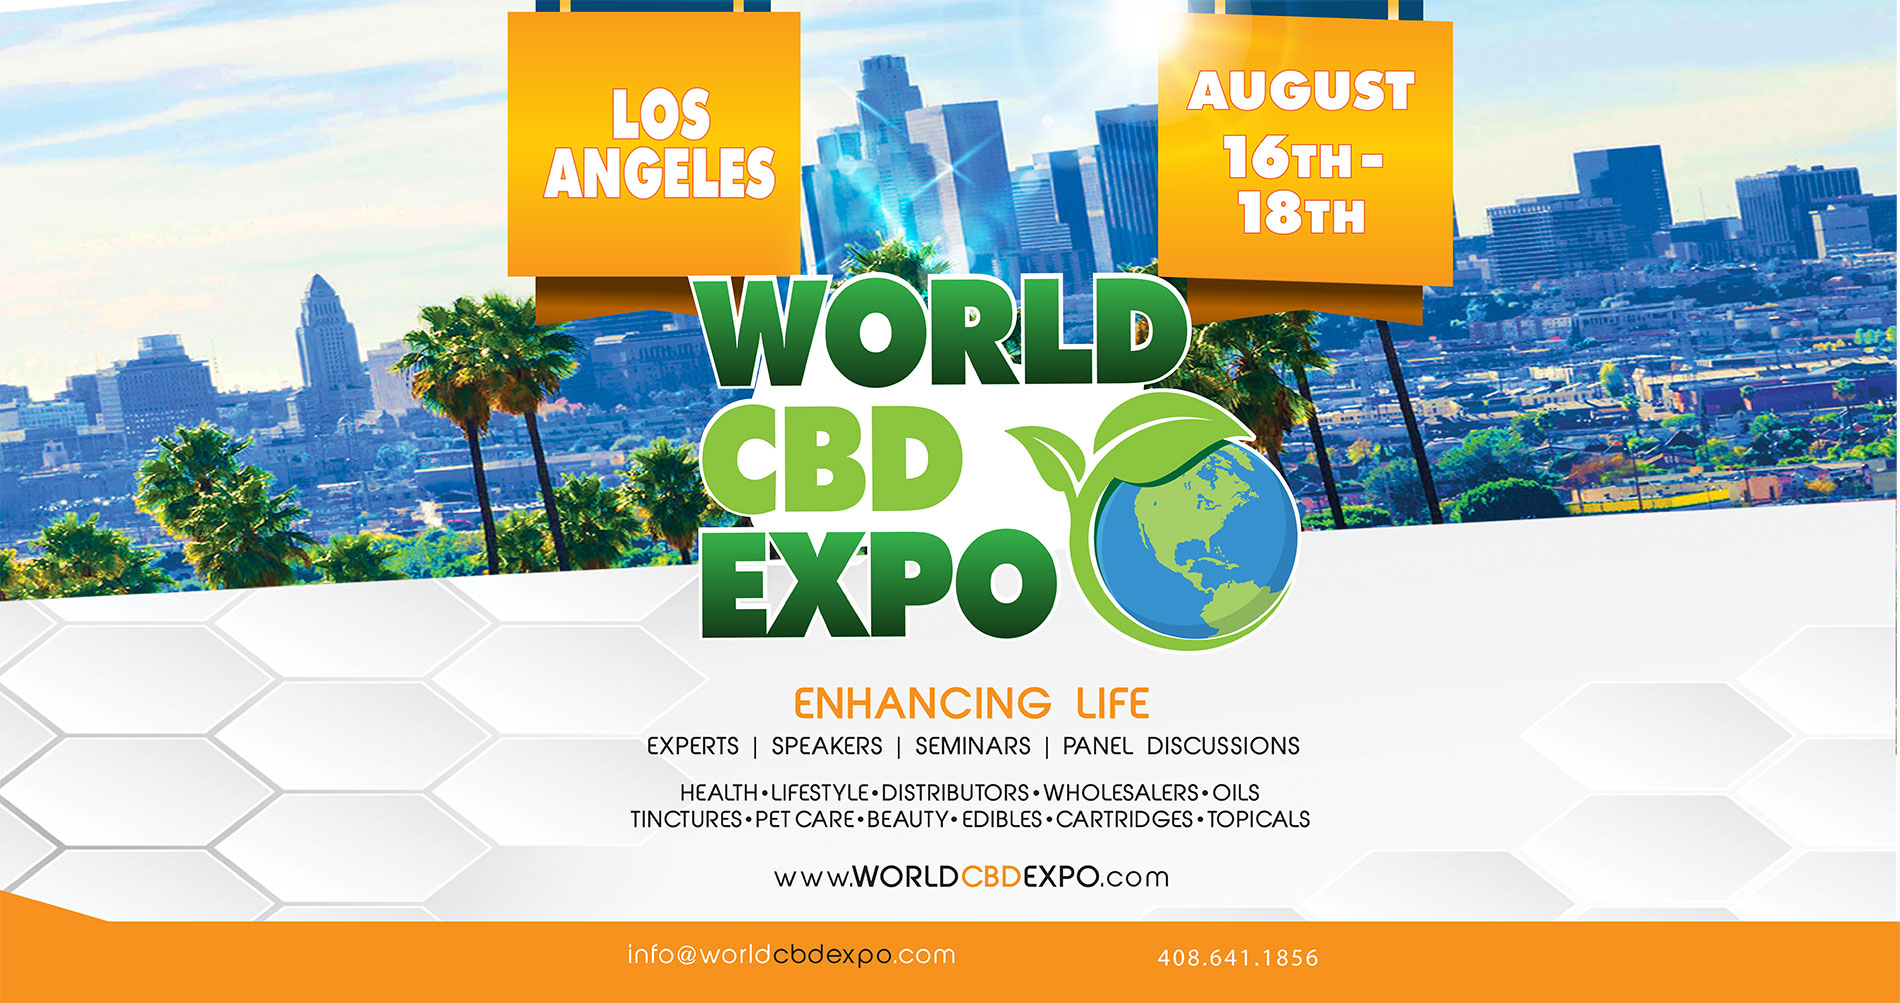 World CBD EXPO in Los Angeles, CA